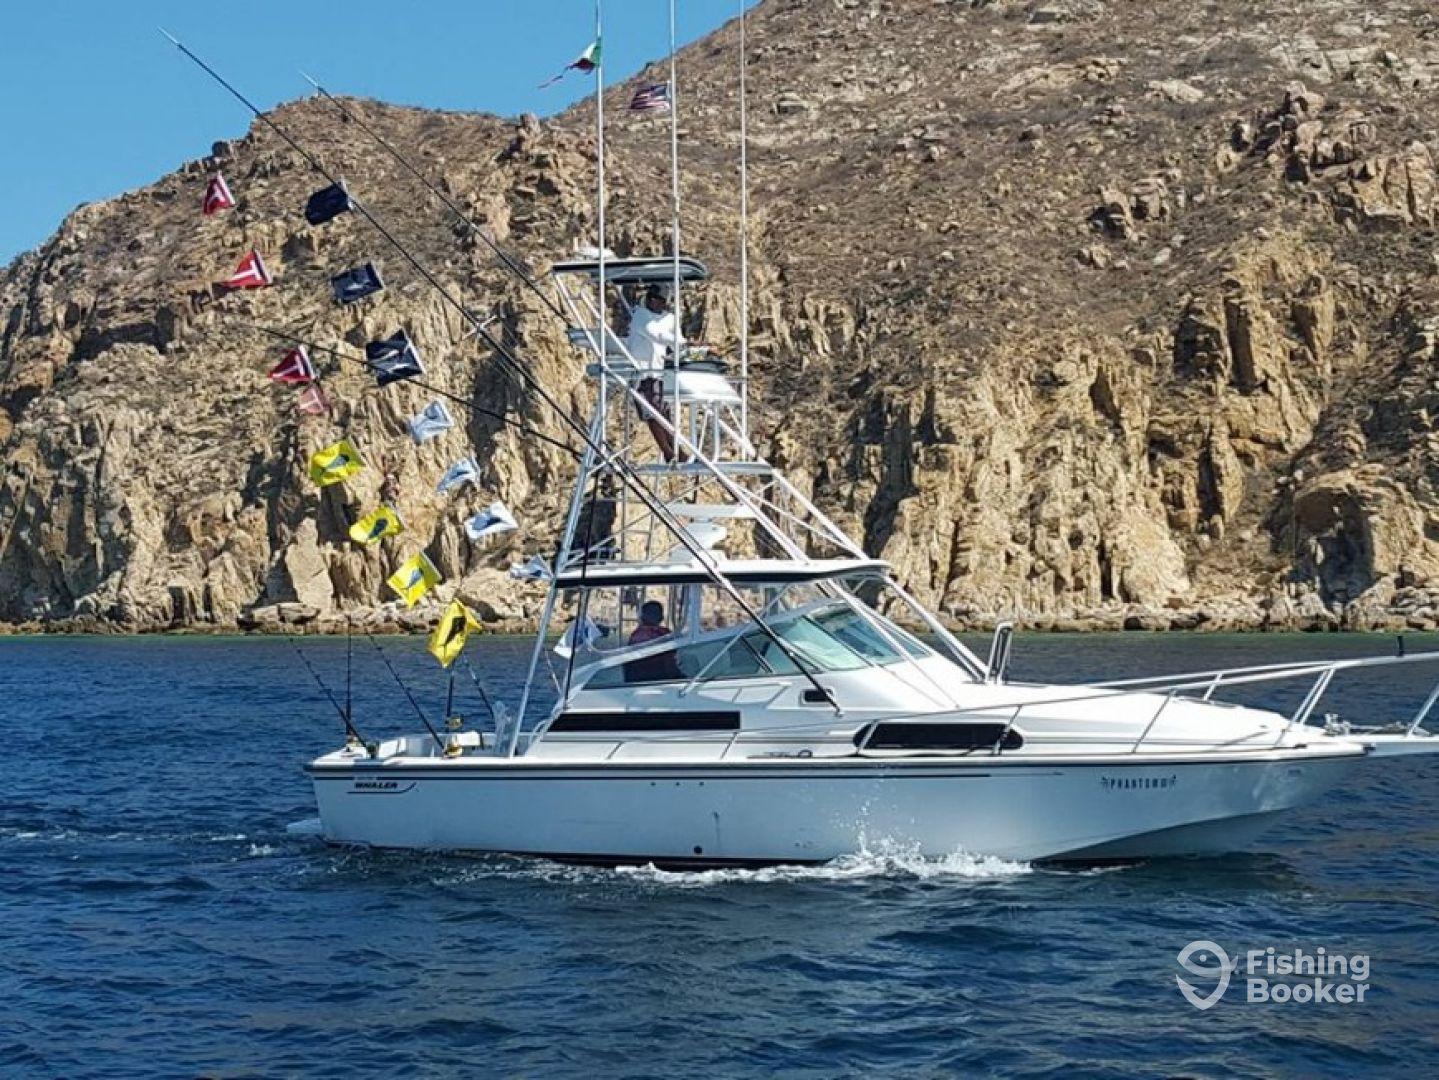 Phantom fishing cabo phantom iii cabo san lucas mexico for Fishing cabo san lucas